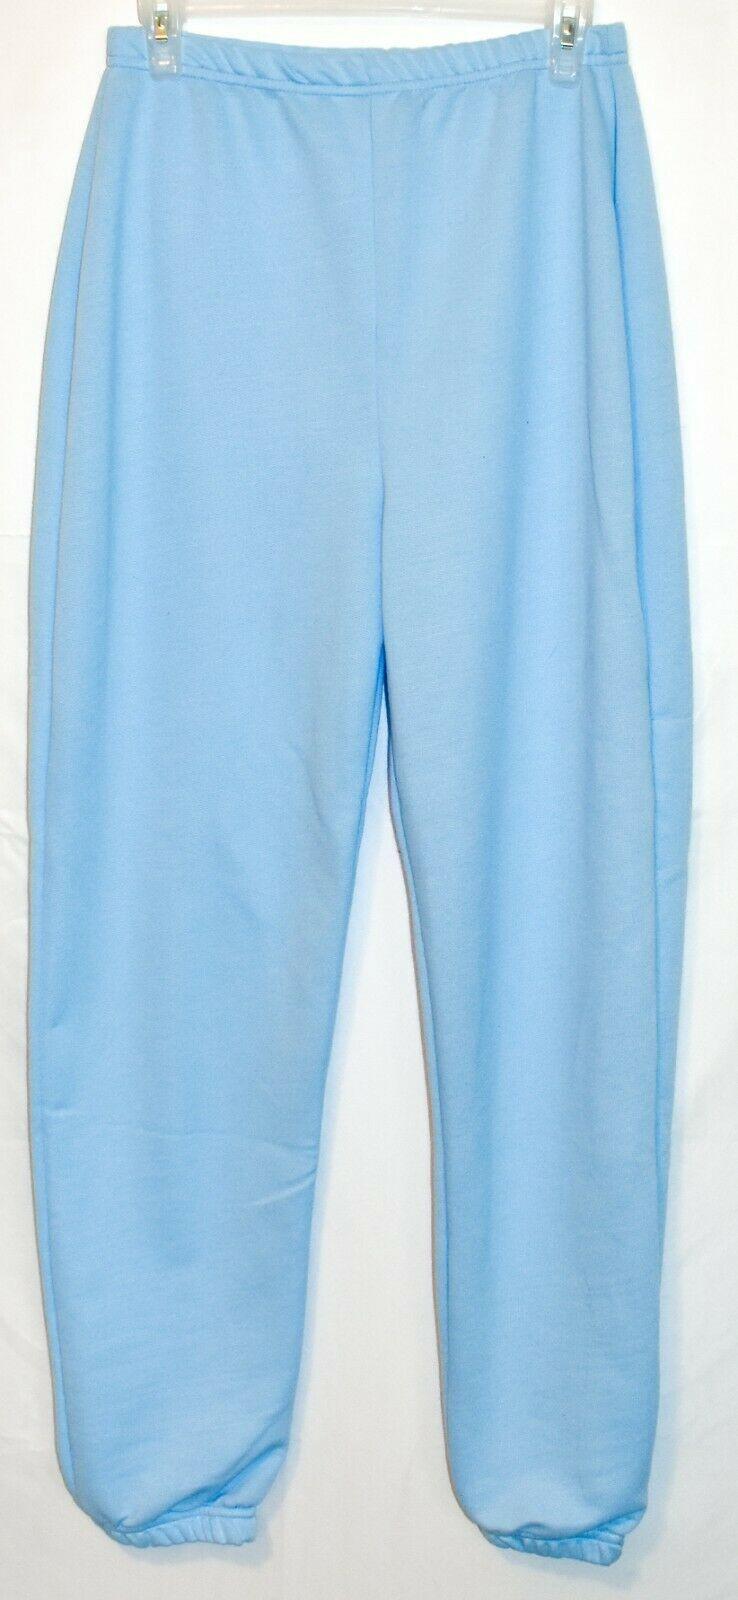 Pretty Little Thing Women's Light Blue Oversized Basic Cuff Joggers Pants Size 6